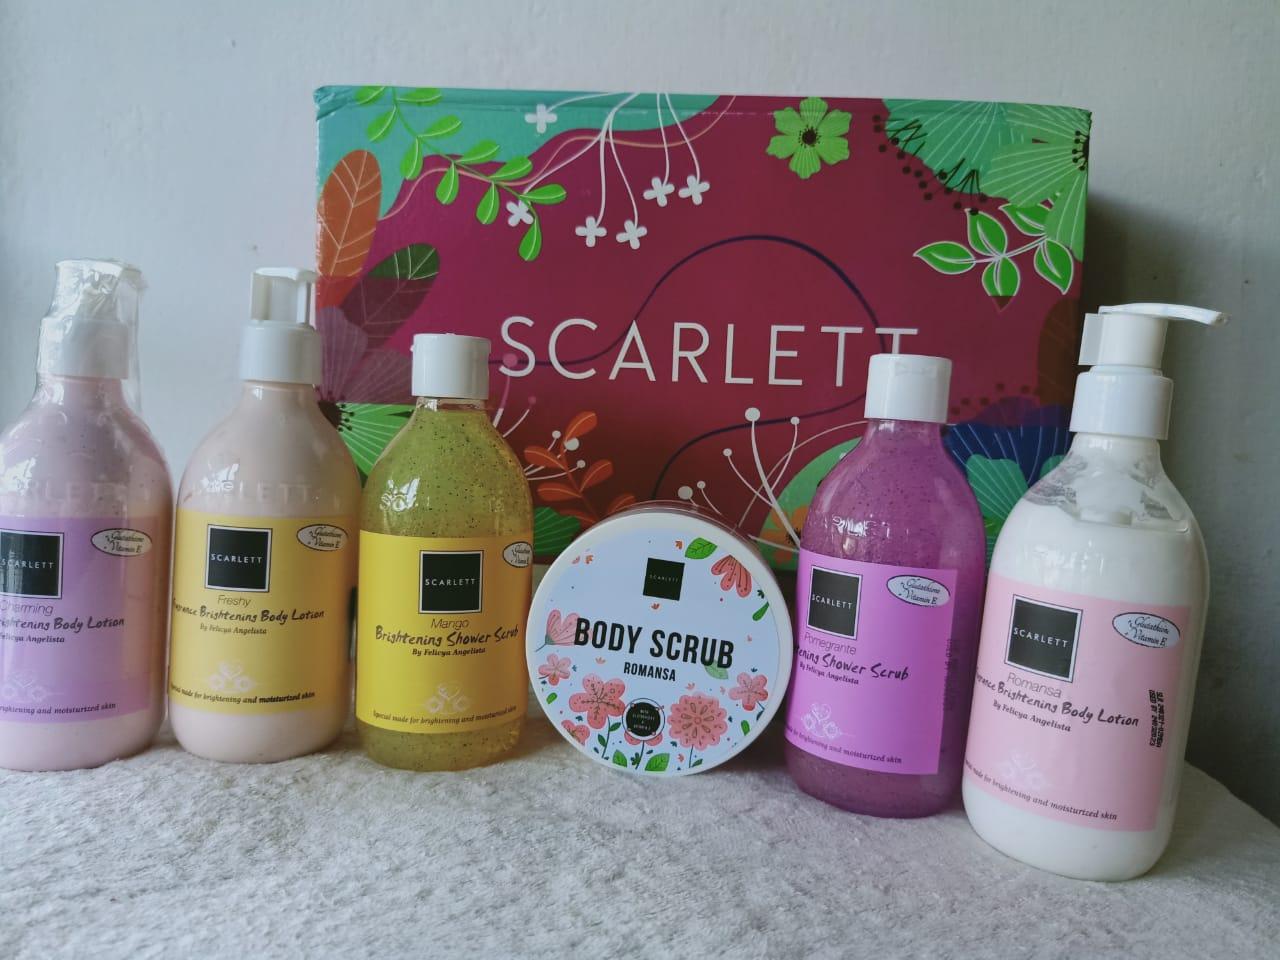 Rangkaian produk scarlett